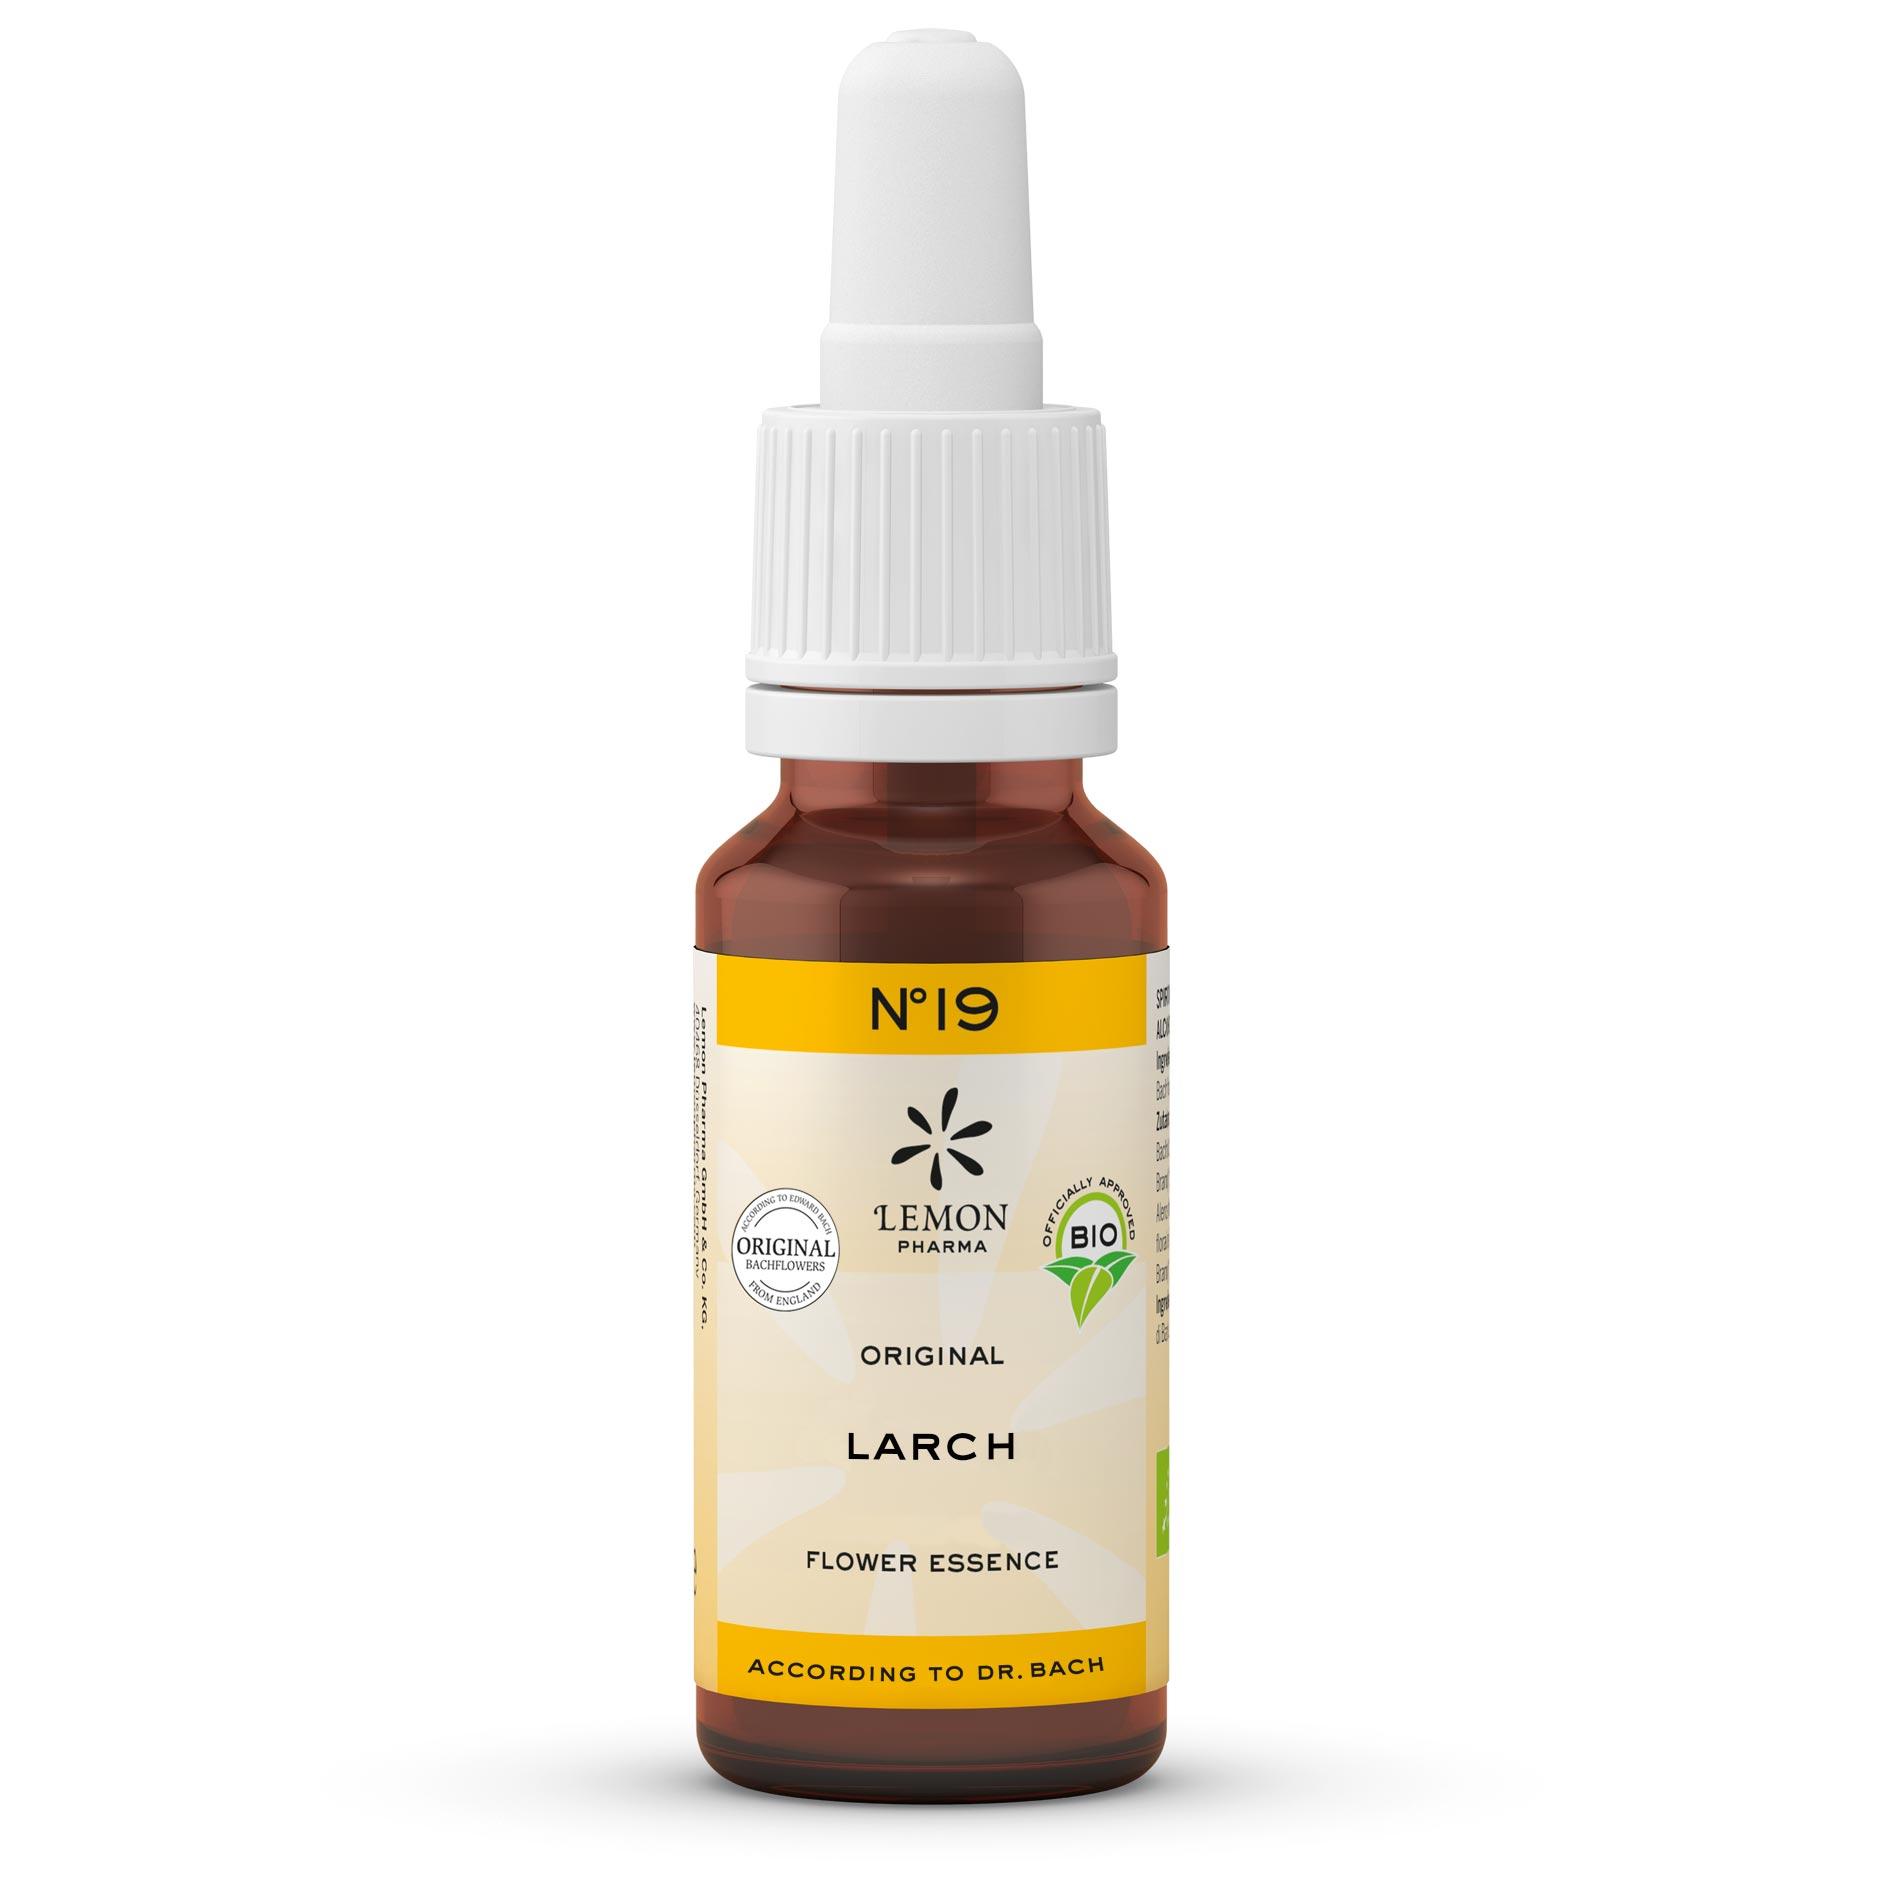 Lemon Pharma Original Bachblüten Tropfen Nr 19 Larch Europäische Lärche Selbstvertrauen